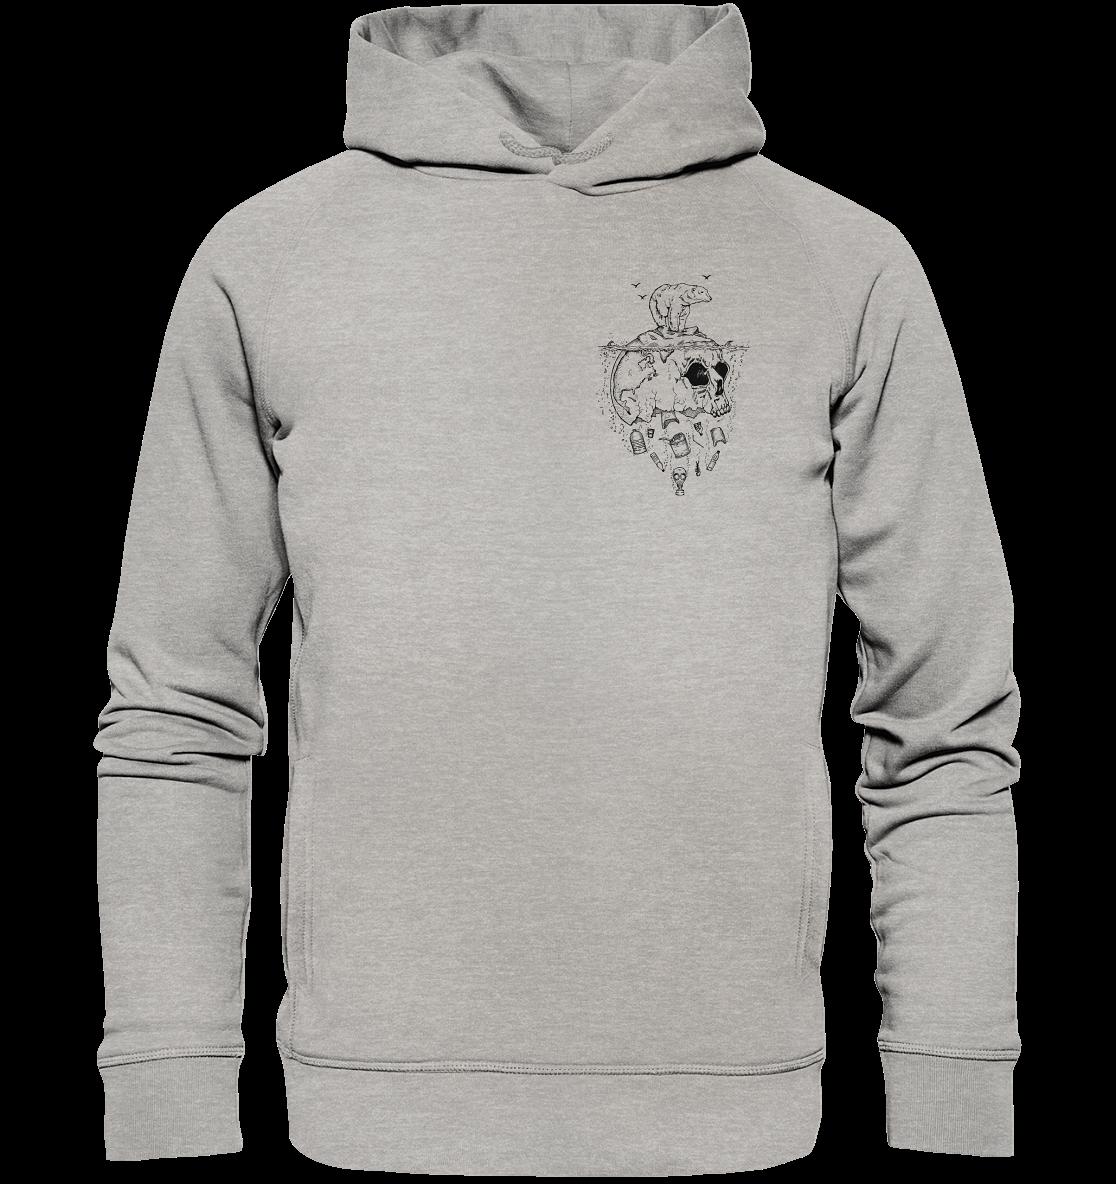 front-organic-fashion-hoodie-c2c1c0-1116x-19.png